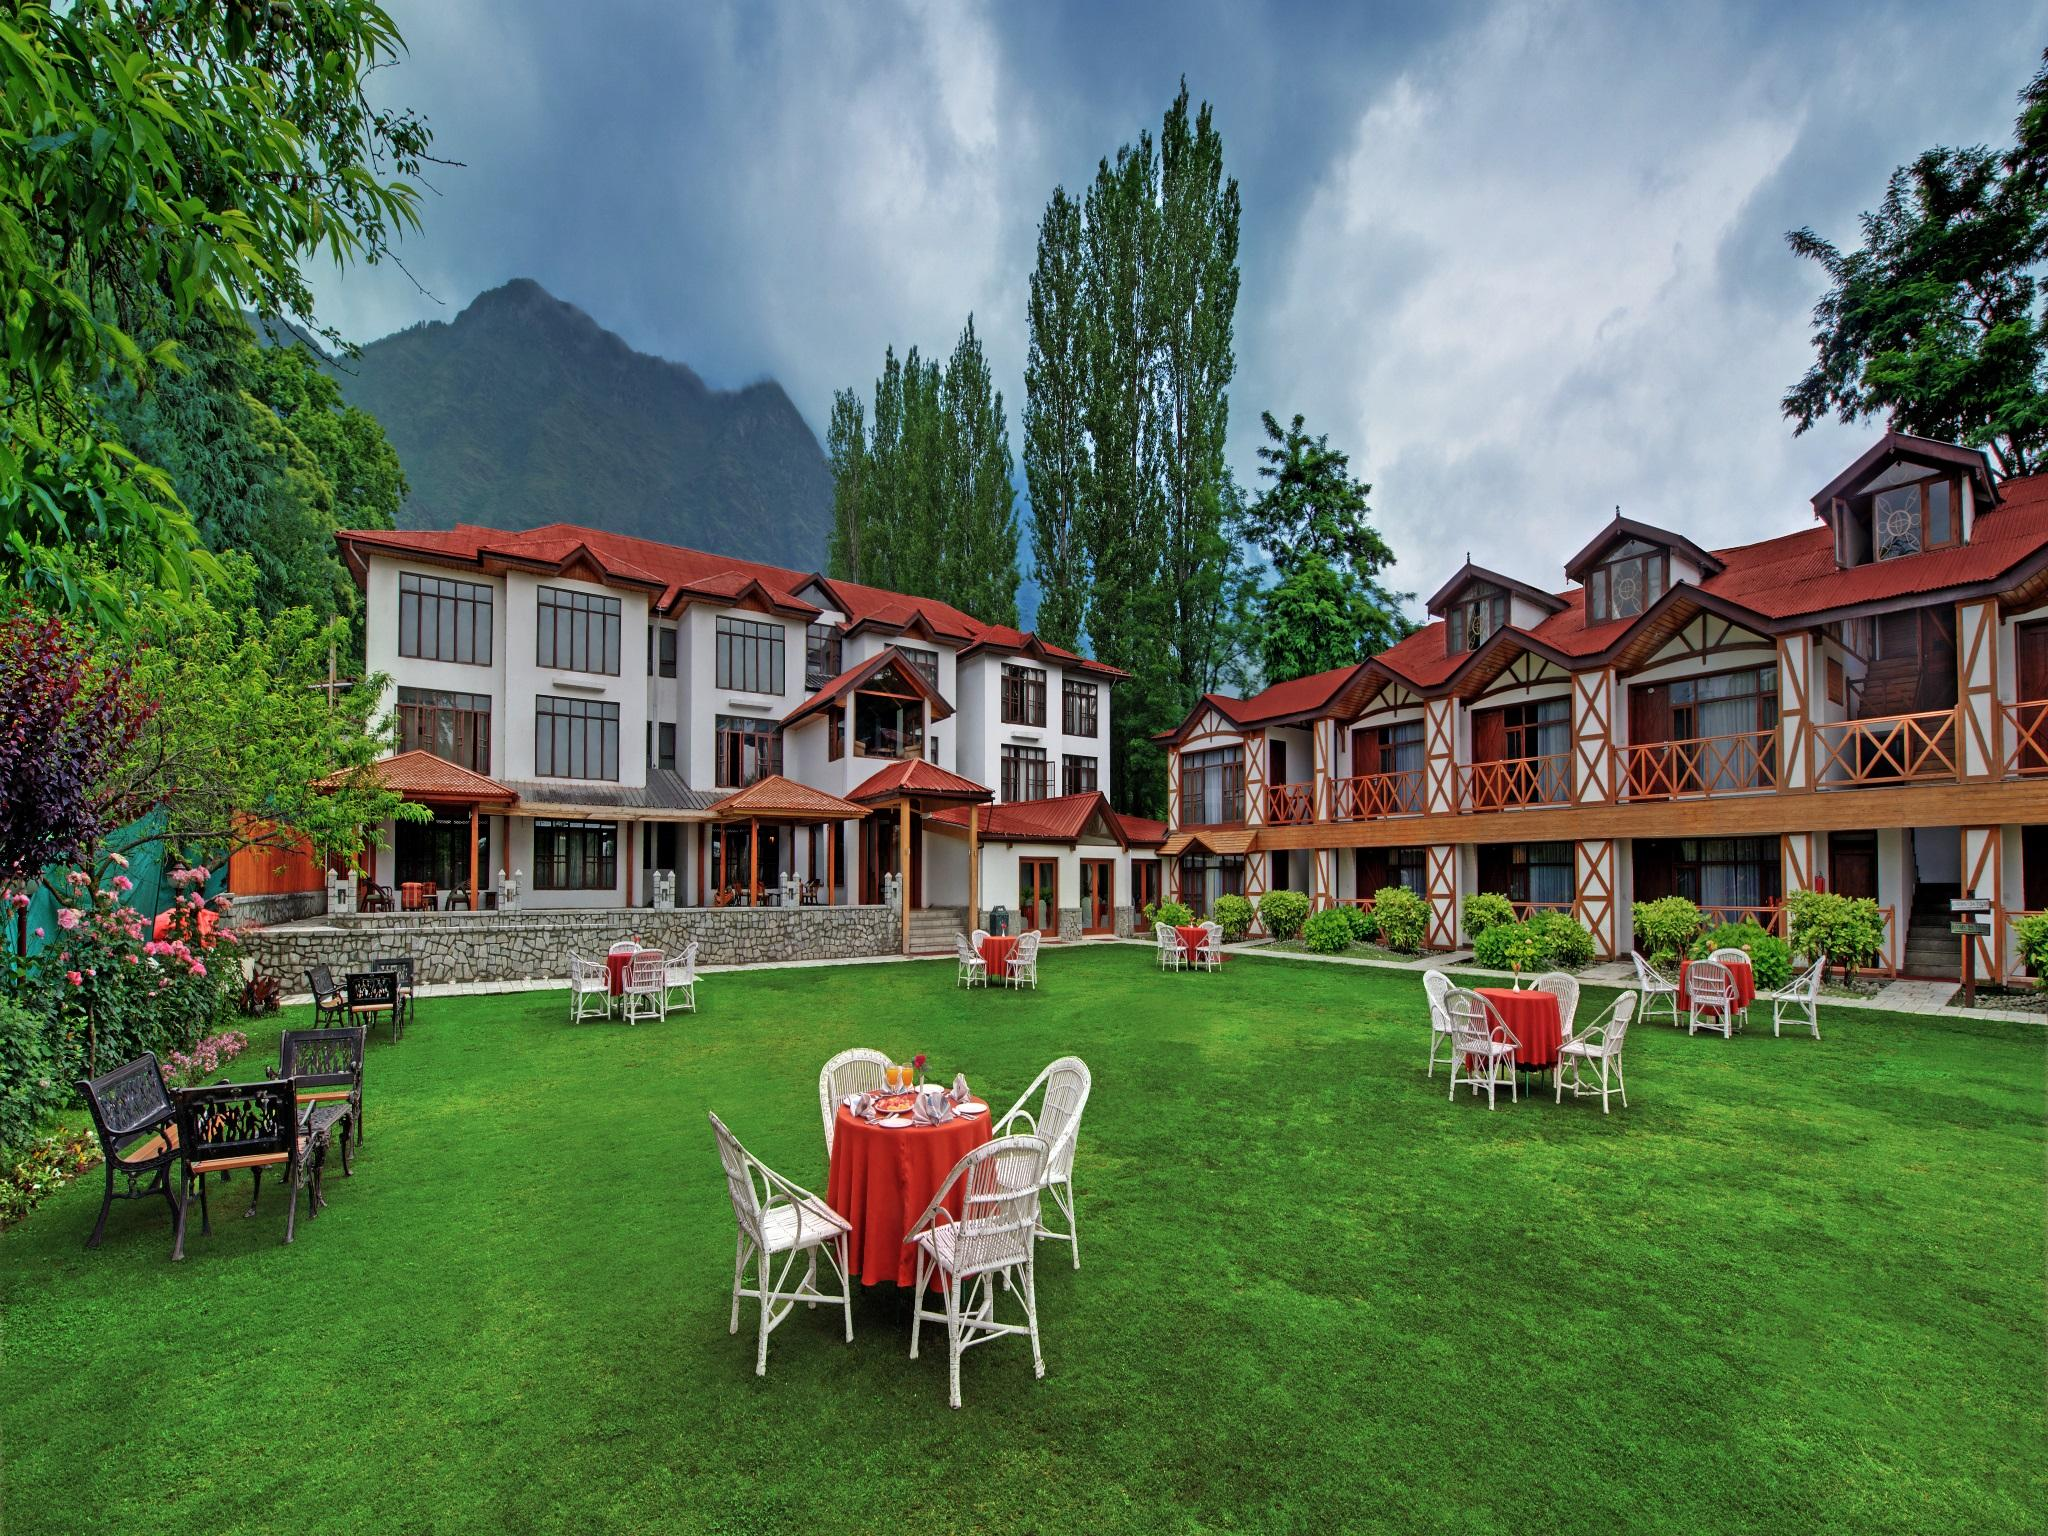 fortune resort heevan member itc s hotel group room deals rh agoda com